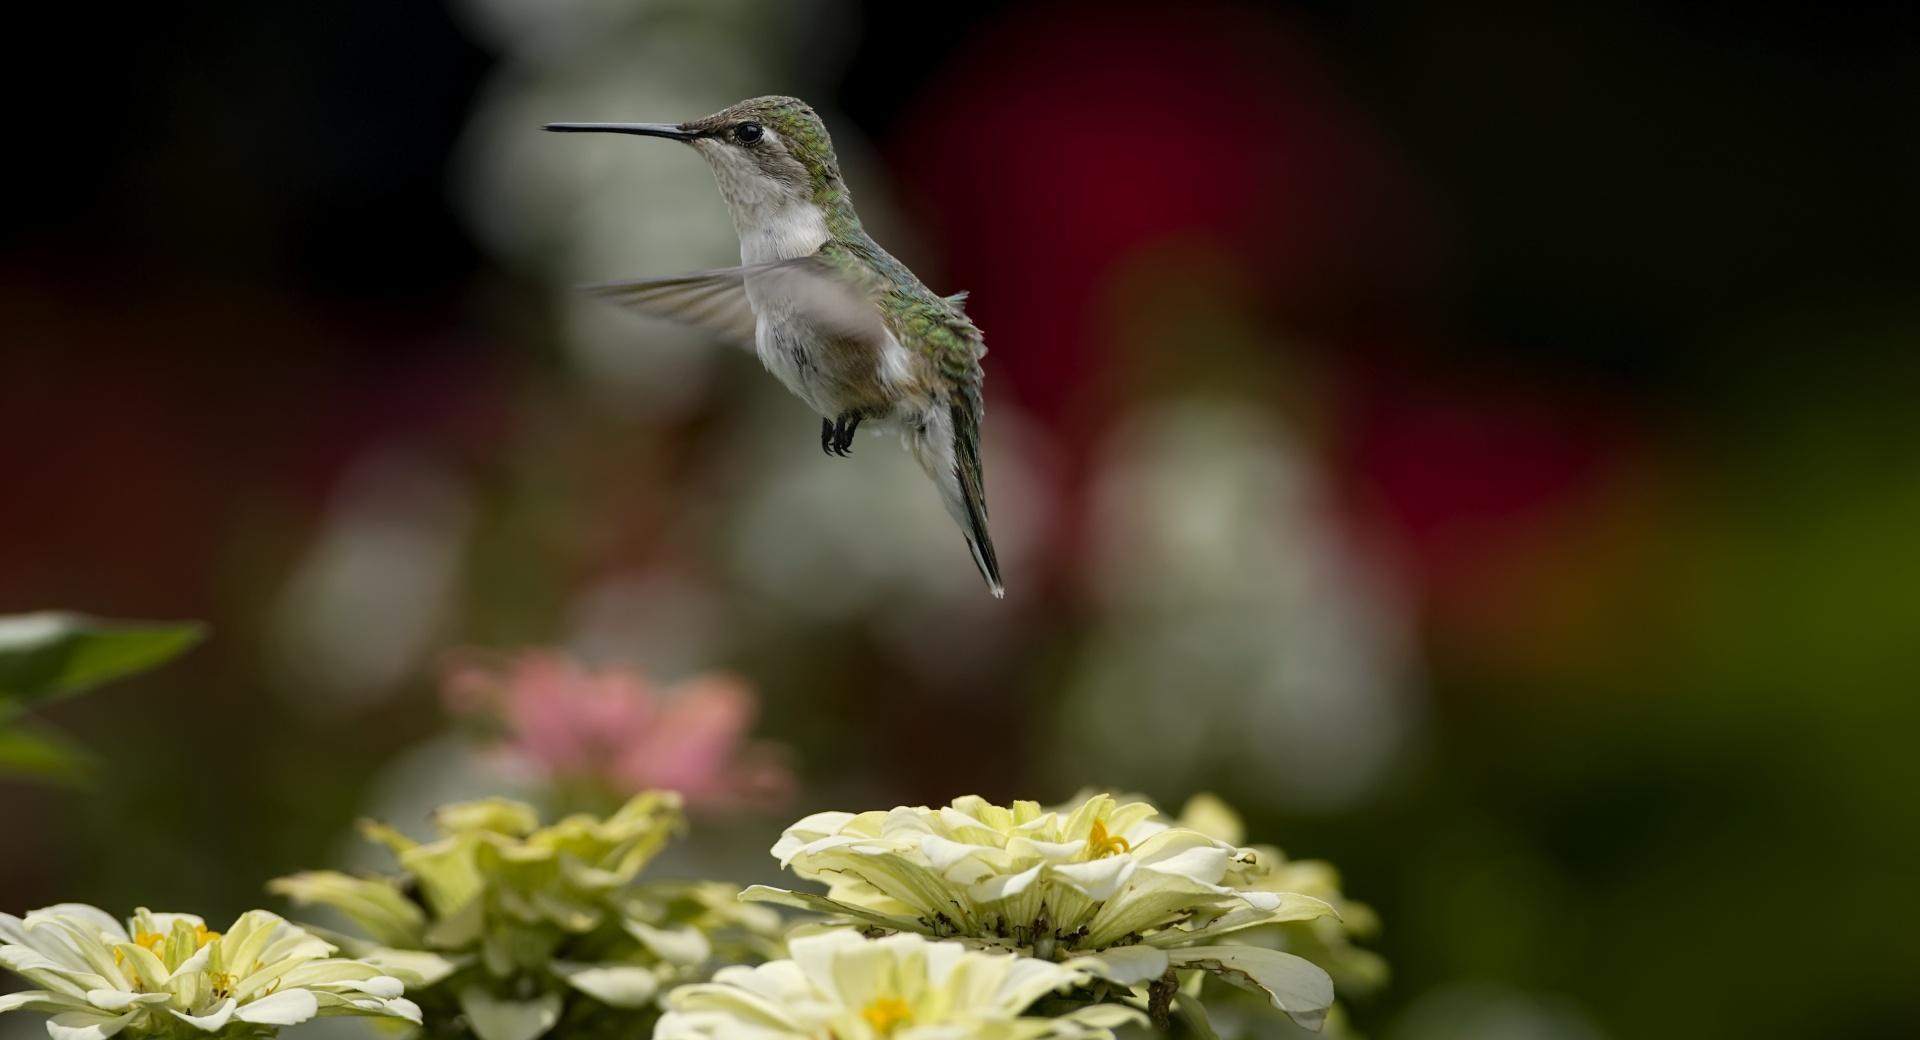 Humming-bird wallpapers HD quality